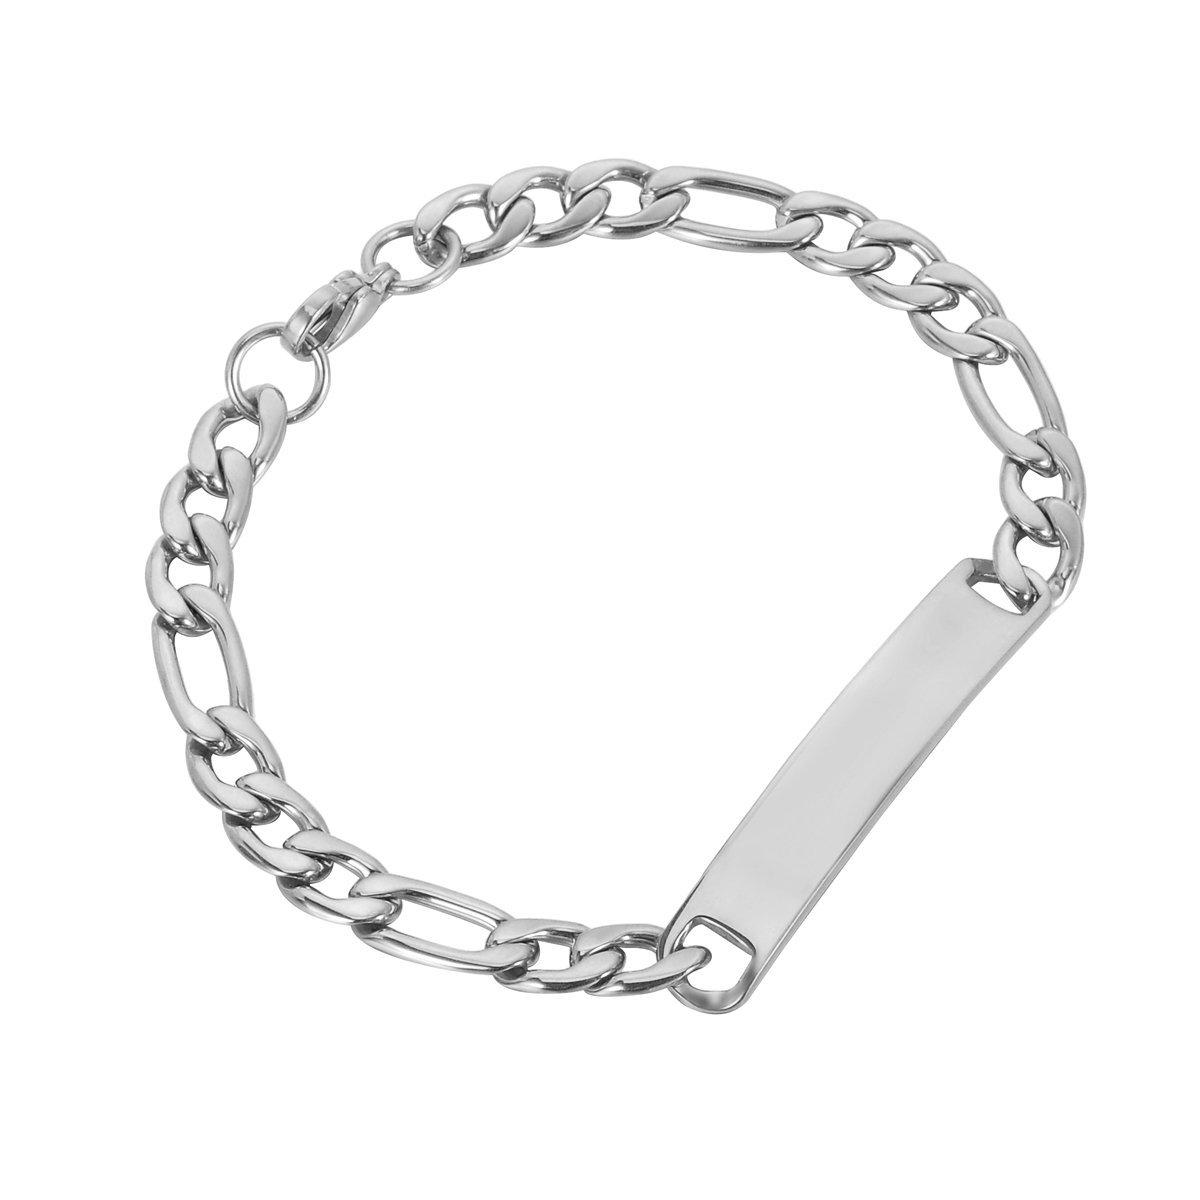 HooAMI Stainless Steel Figaro Chain Link ID Bracelet - Free Engraving TY EGBETY99794